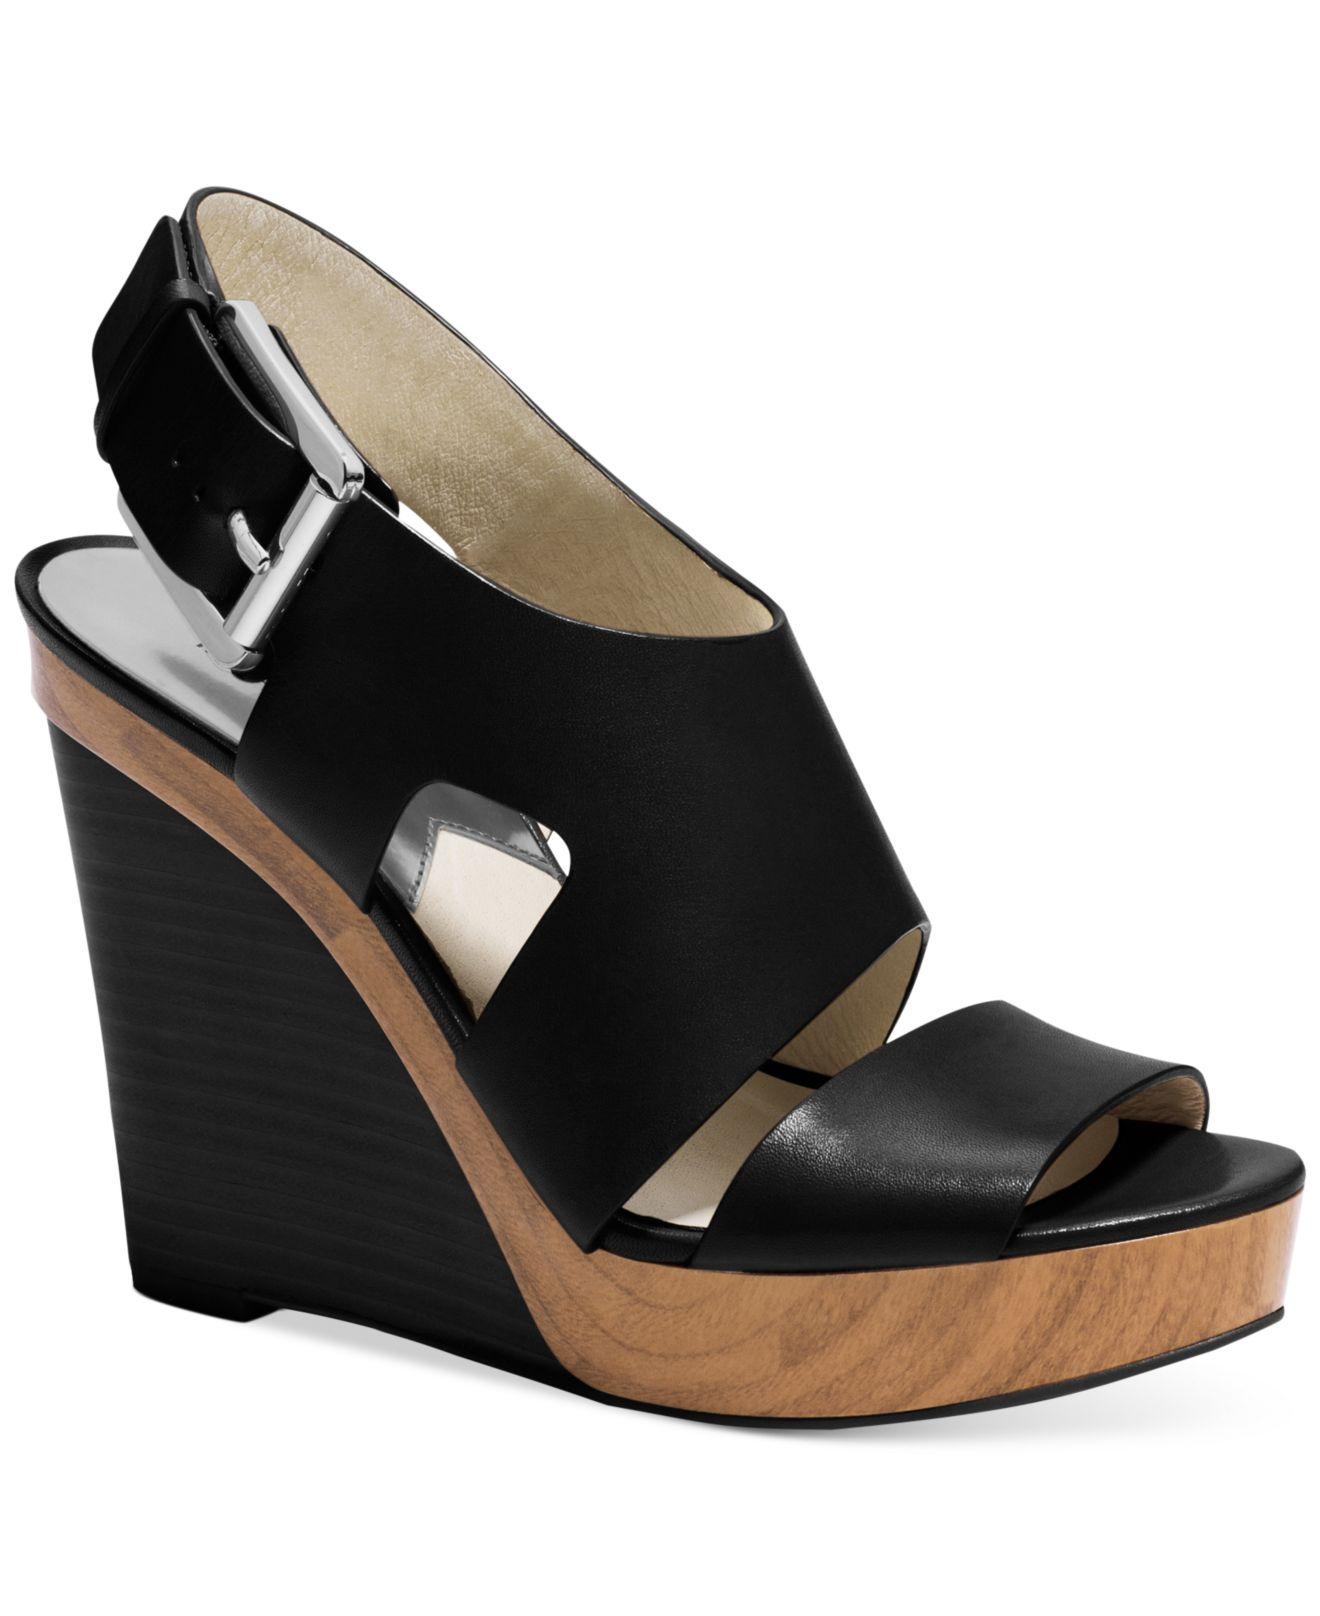 1b9dc07a4f8 Lyst - Michael Kors Michael Carla Platform Wedge Sandals in Black